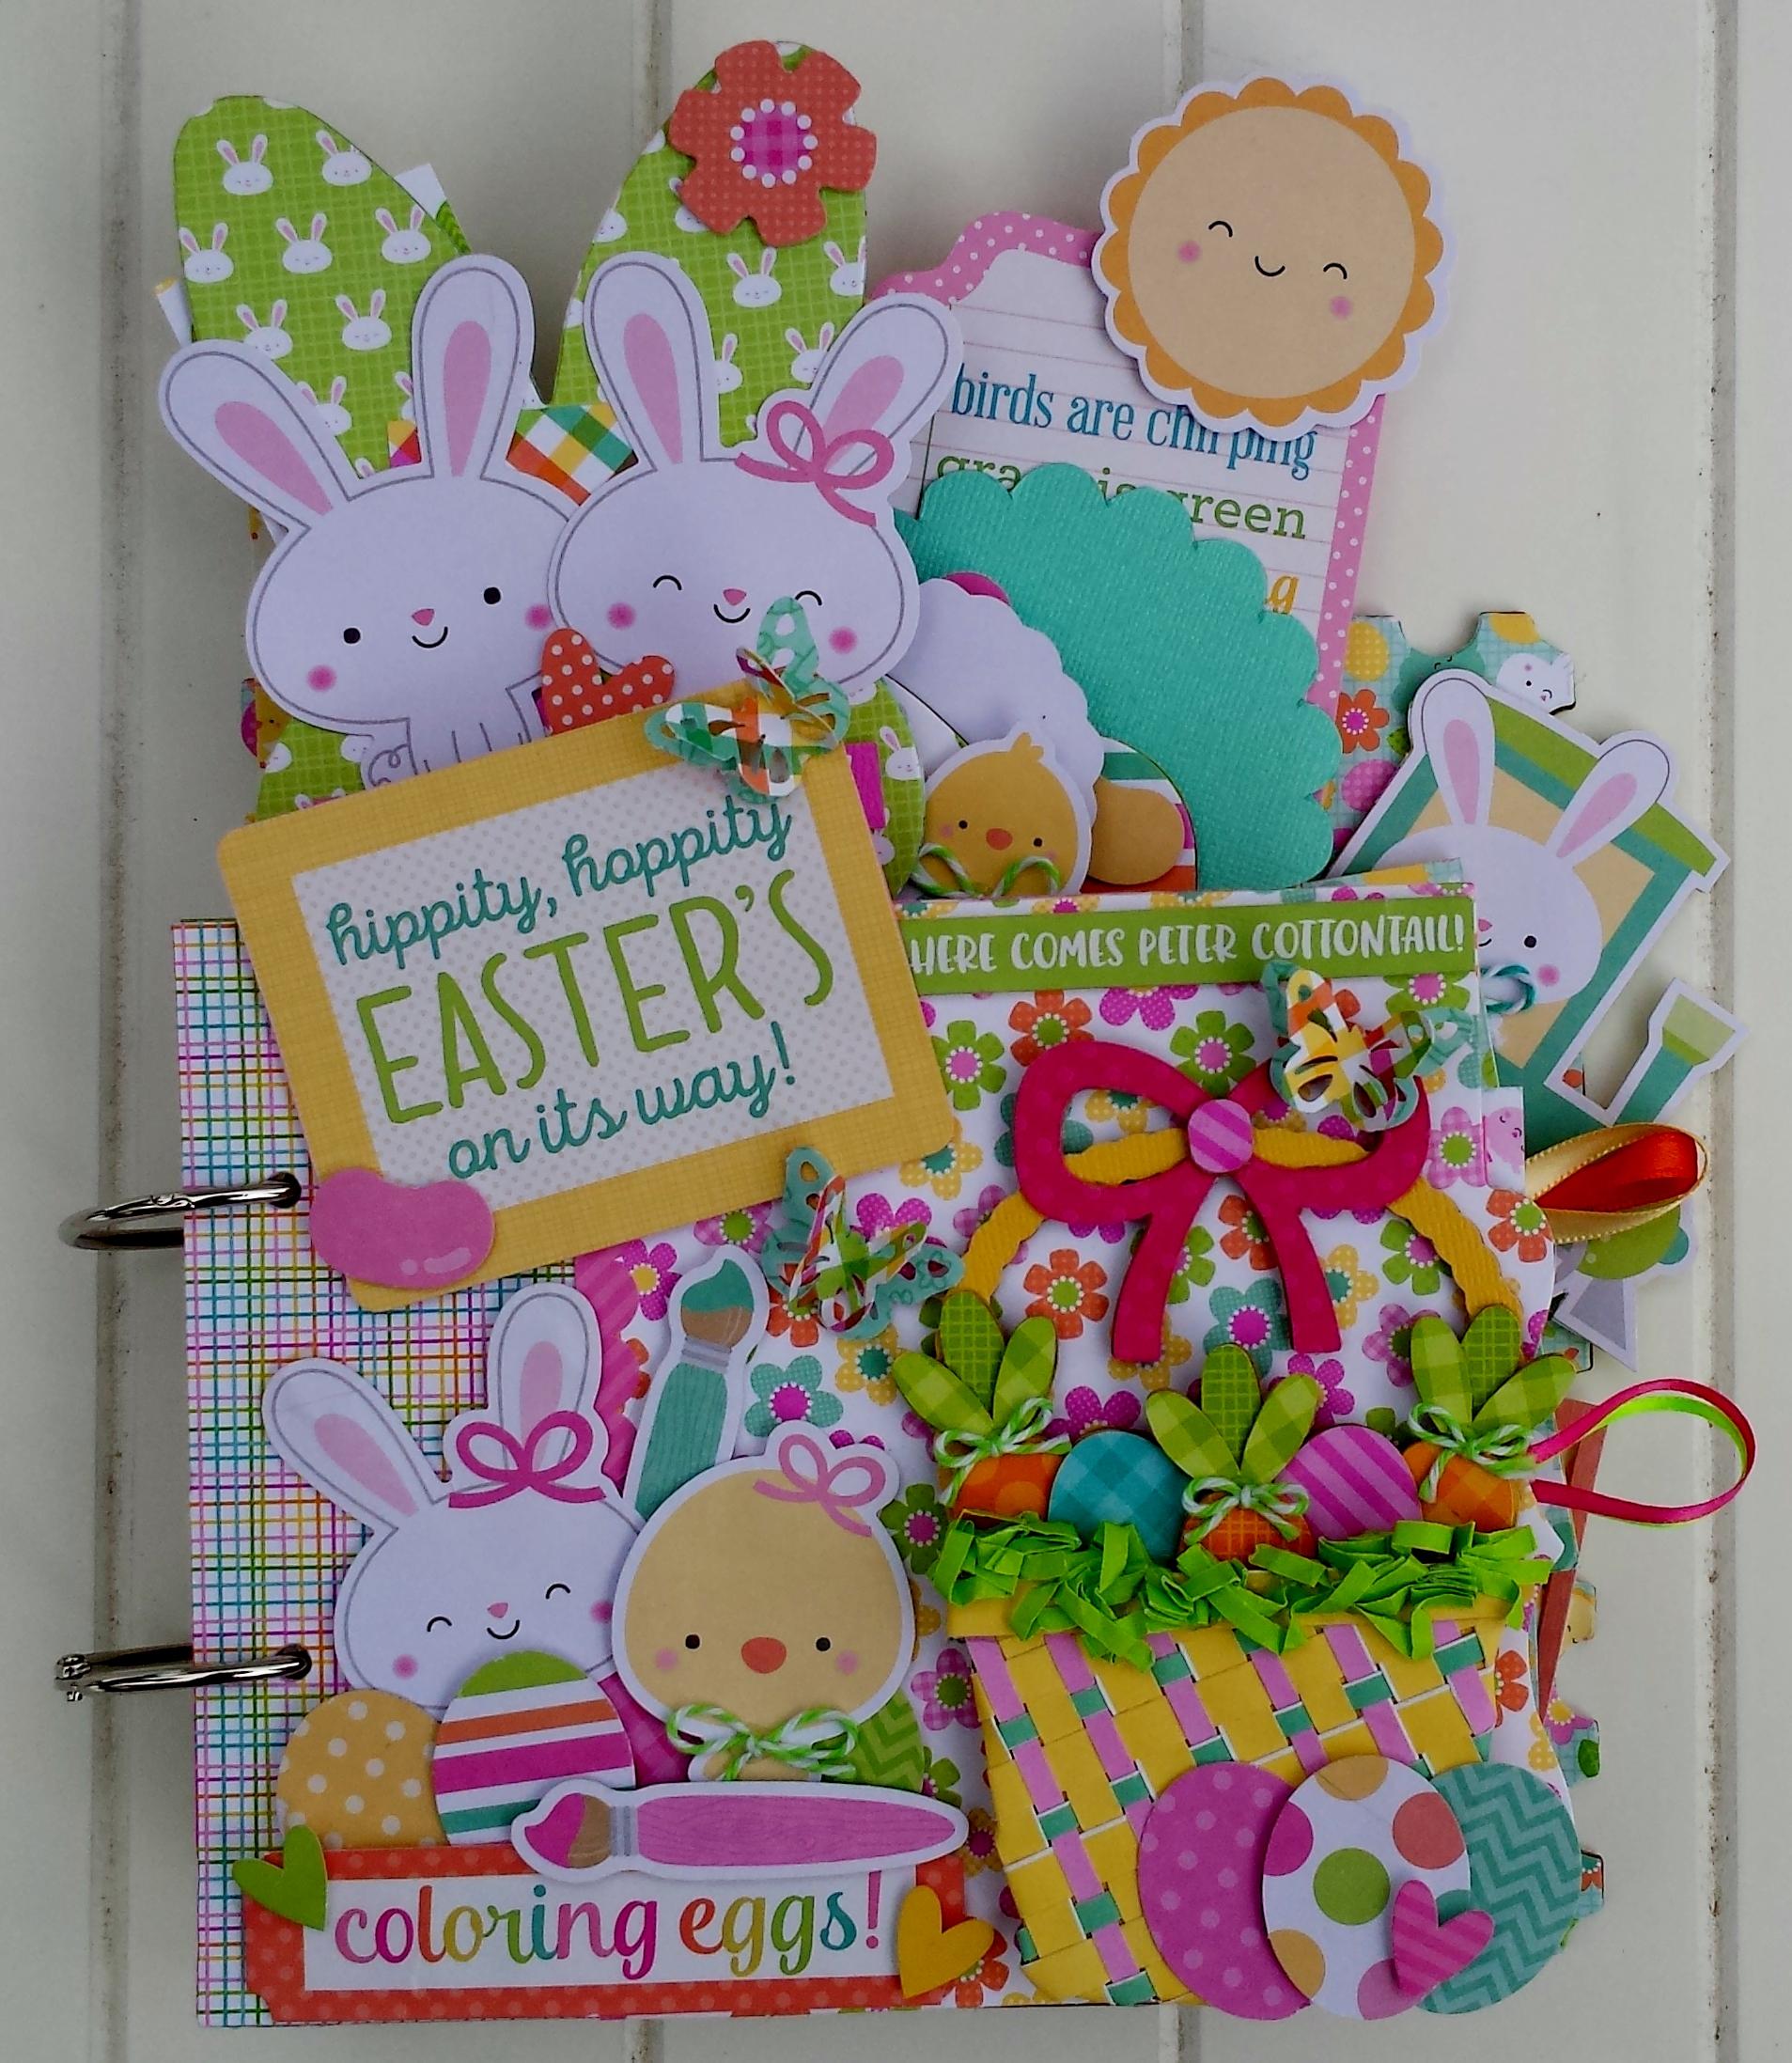 Hippity Hoppity Easter S On Its Way Mini Album Kit